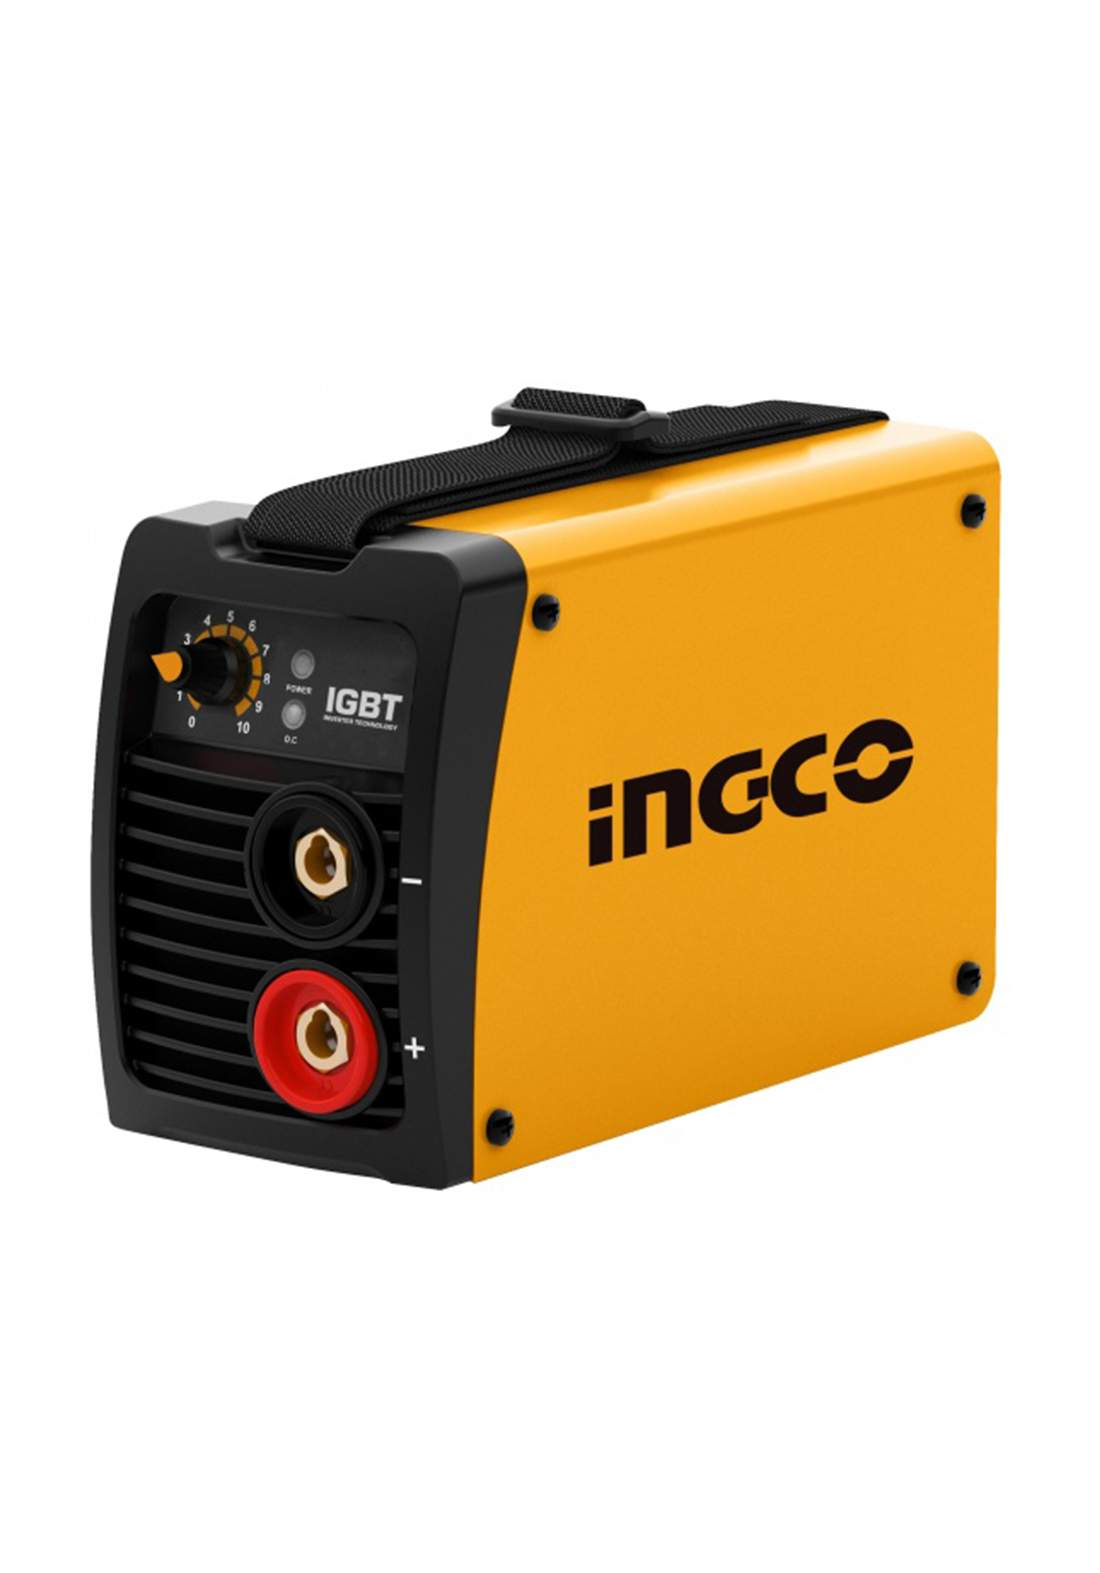 Ingco ING-MMA1305 Inverter MMA Welding Machine ماكنة لحام 130 امبير